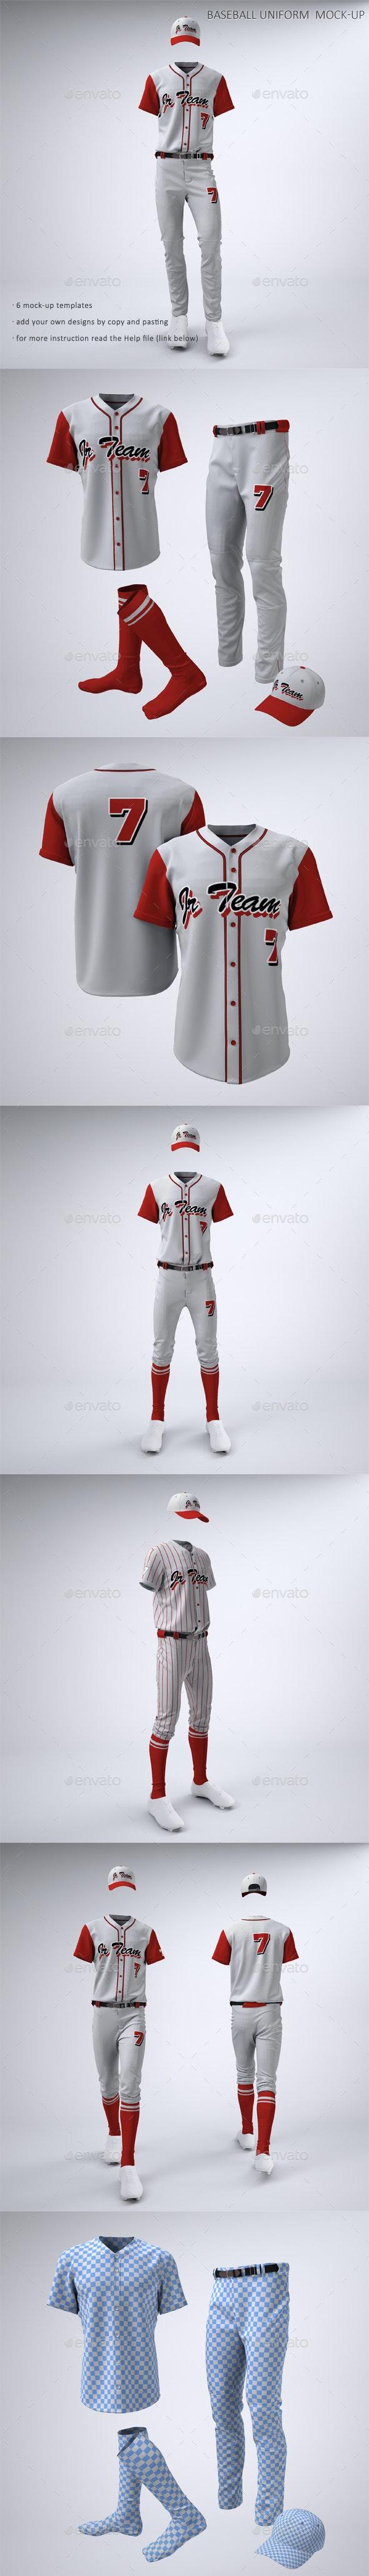 Baseball Team Jerseys and Uniform Mock-up - Apparel Product Mock-Ups